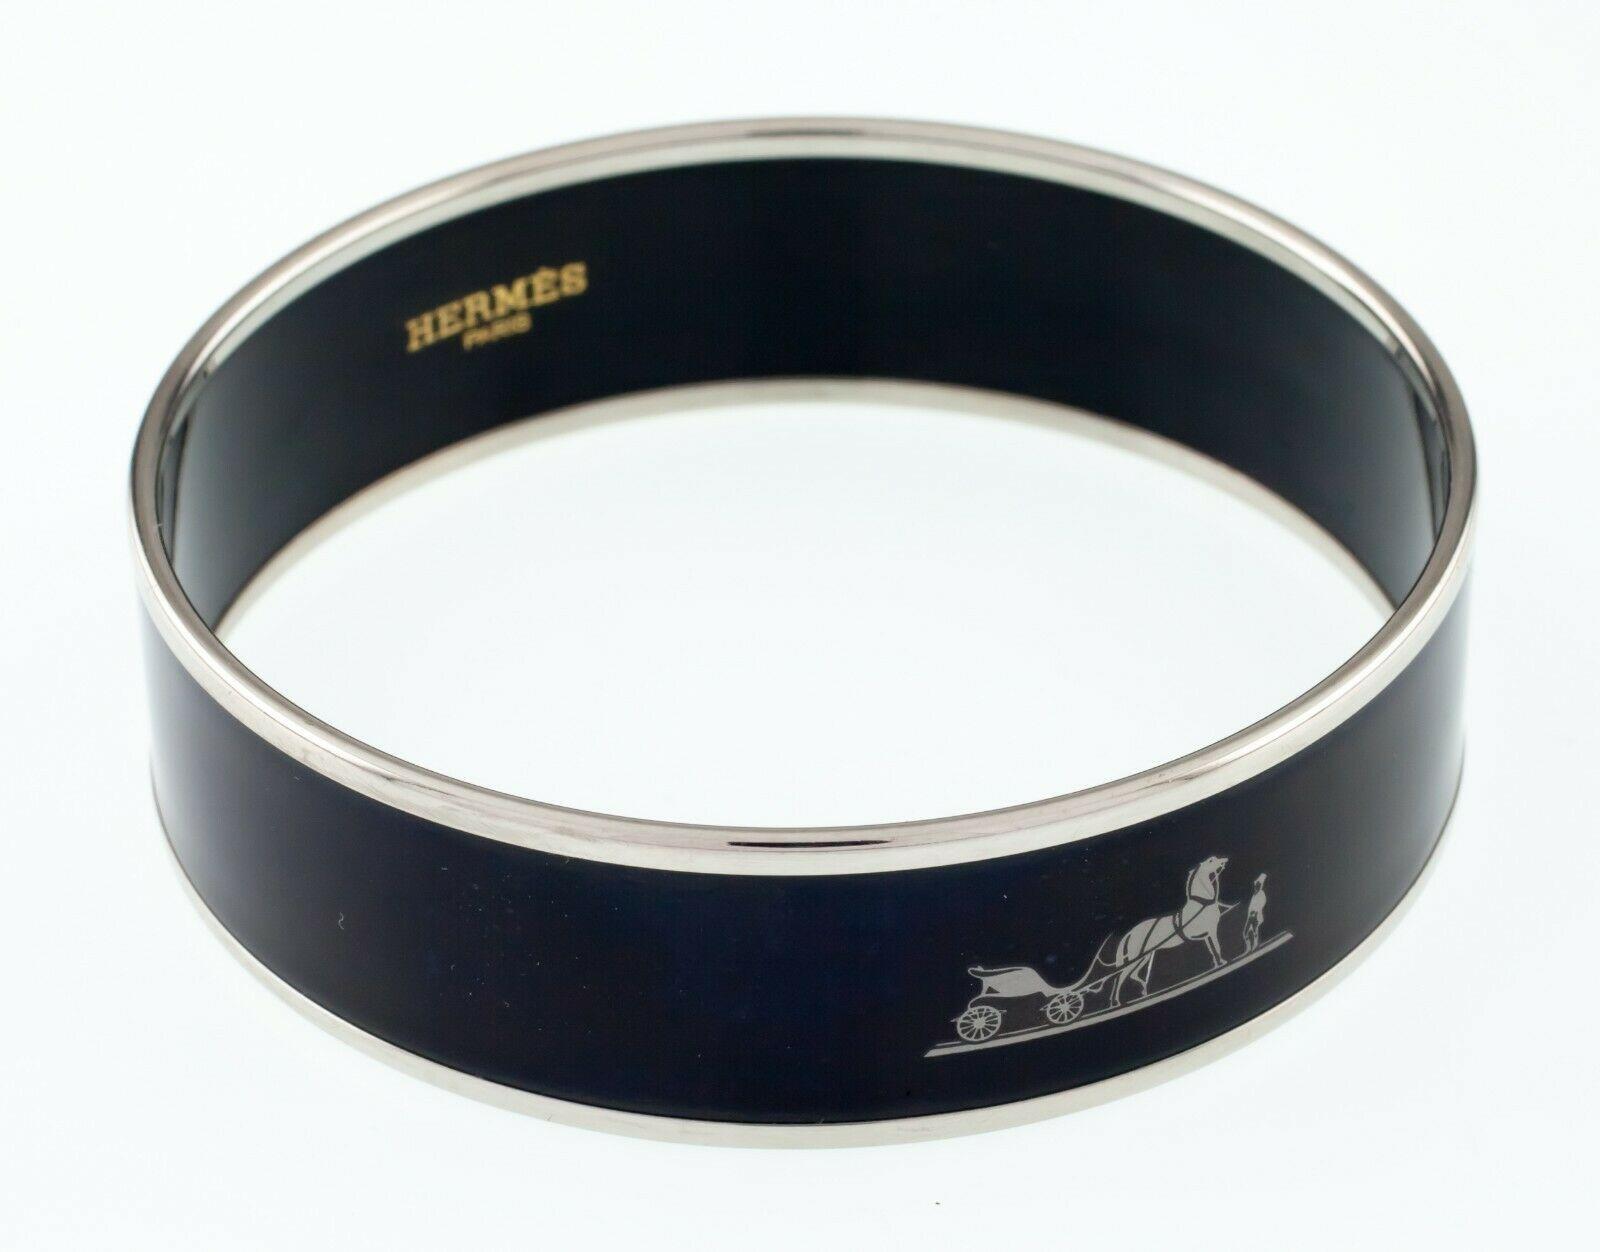 Hermès Esmalte Negro Caleche Brazalete 19mm Ancho Gorgeous! image 4